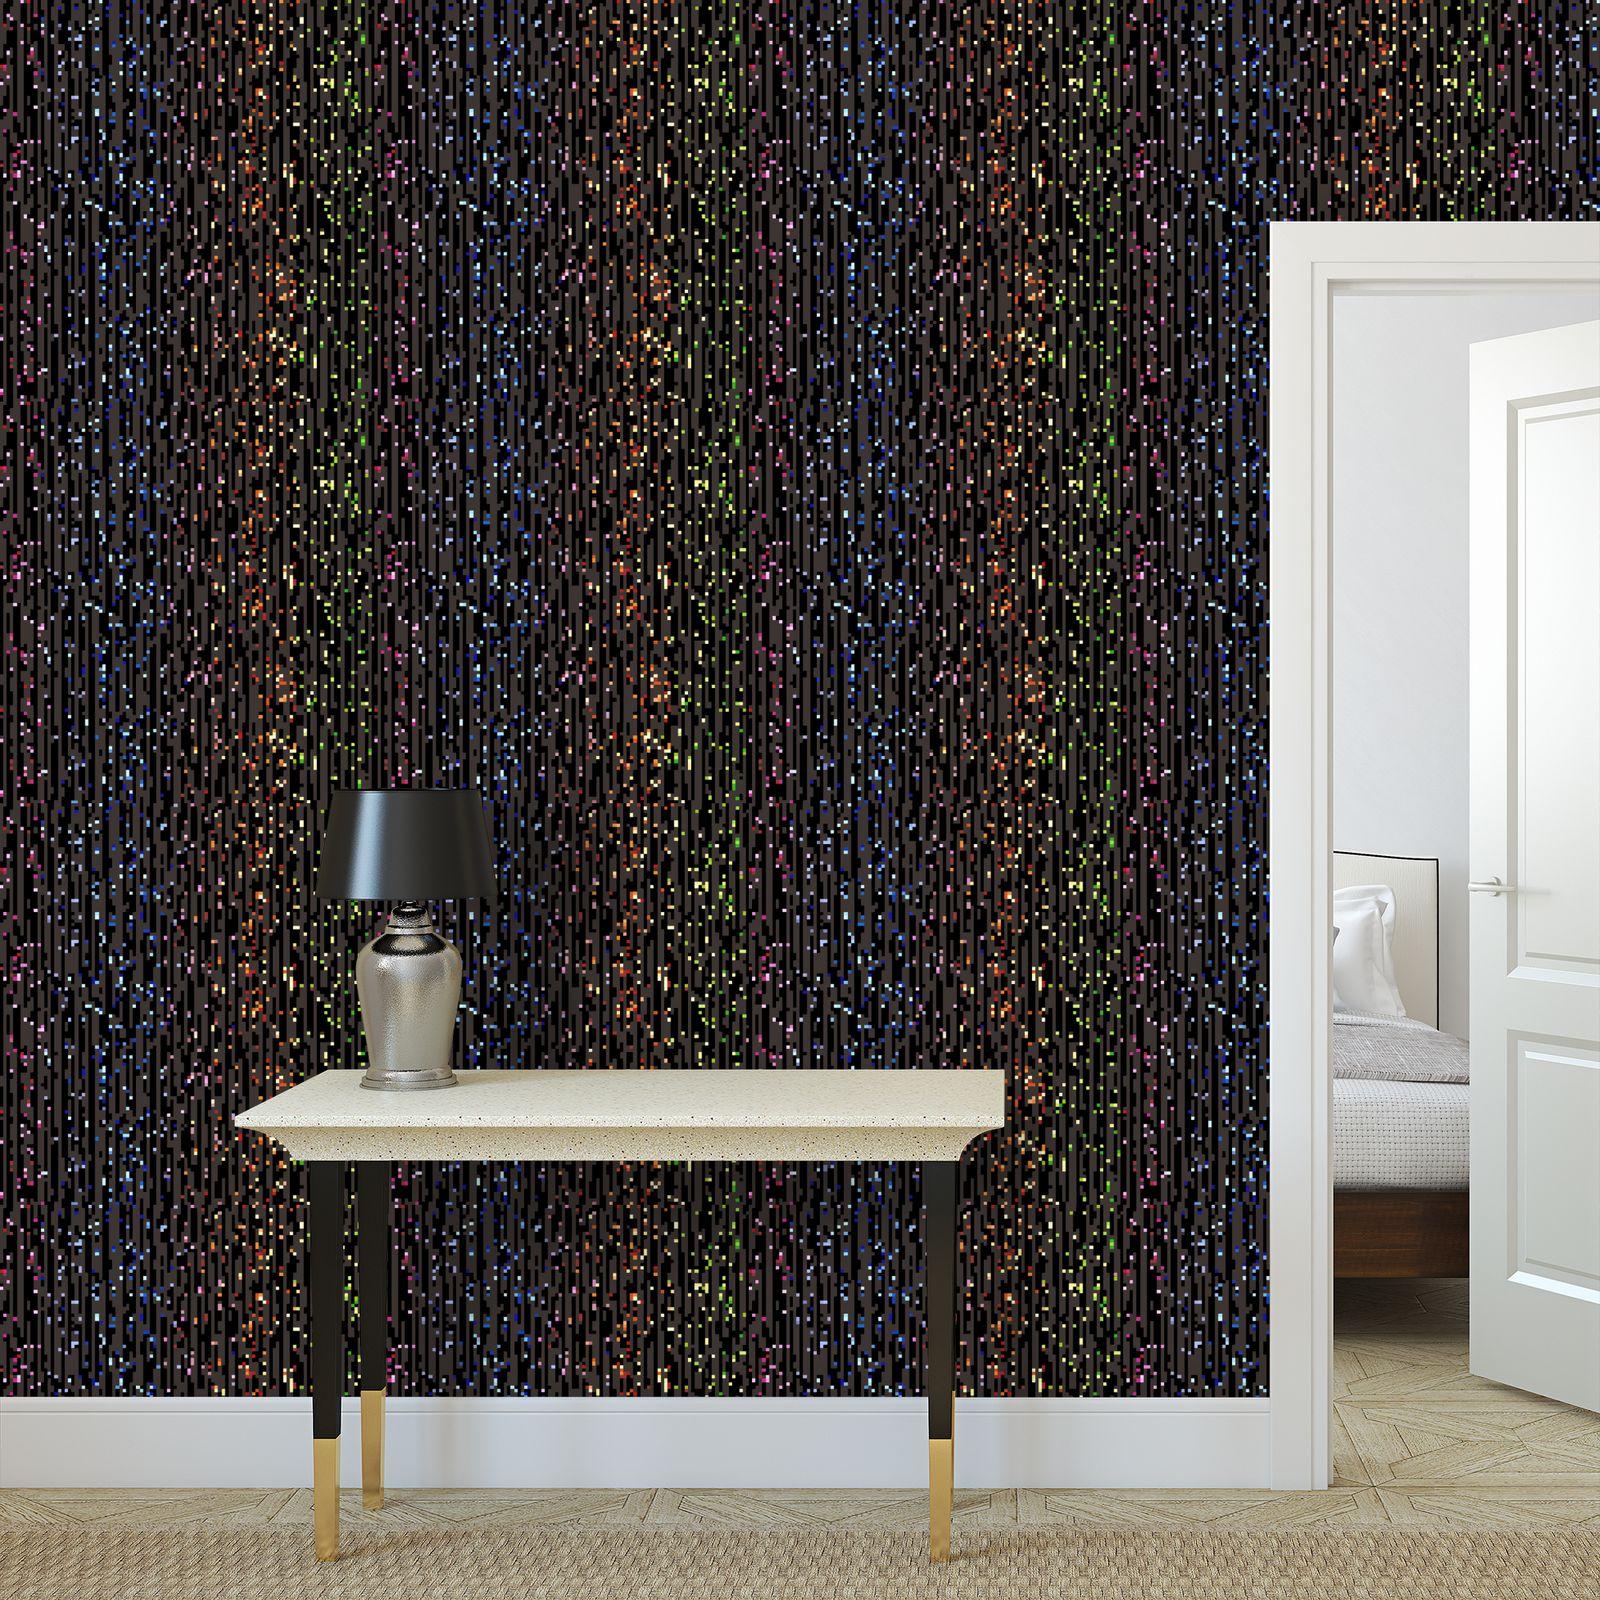 Cabaret Night - Wallpaper Rolls - glitter black, sparkling sparks, scintillant, rainbow gift, iridescent, lurex, glamorous sheen, brilliant chic, Bohemian, spectacular, magical - design by Tiana Lofd